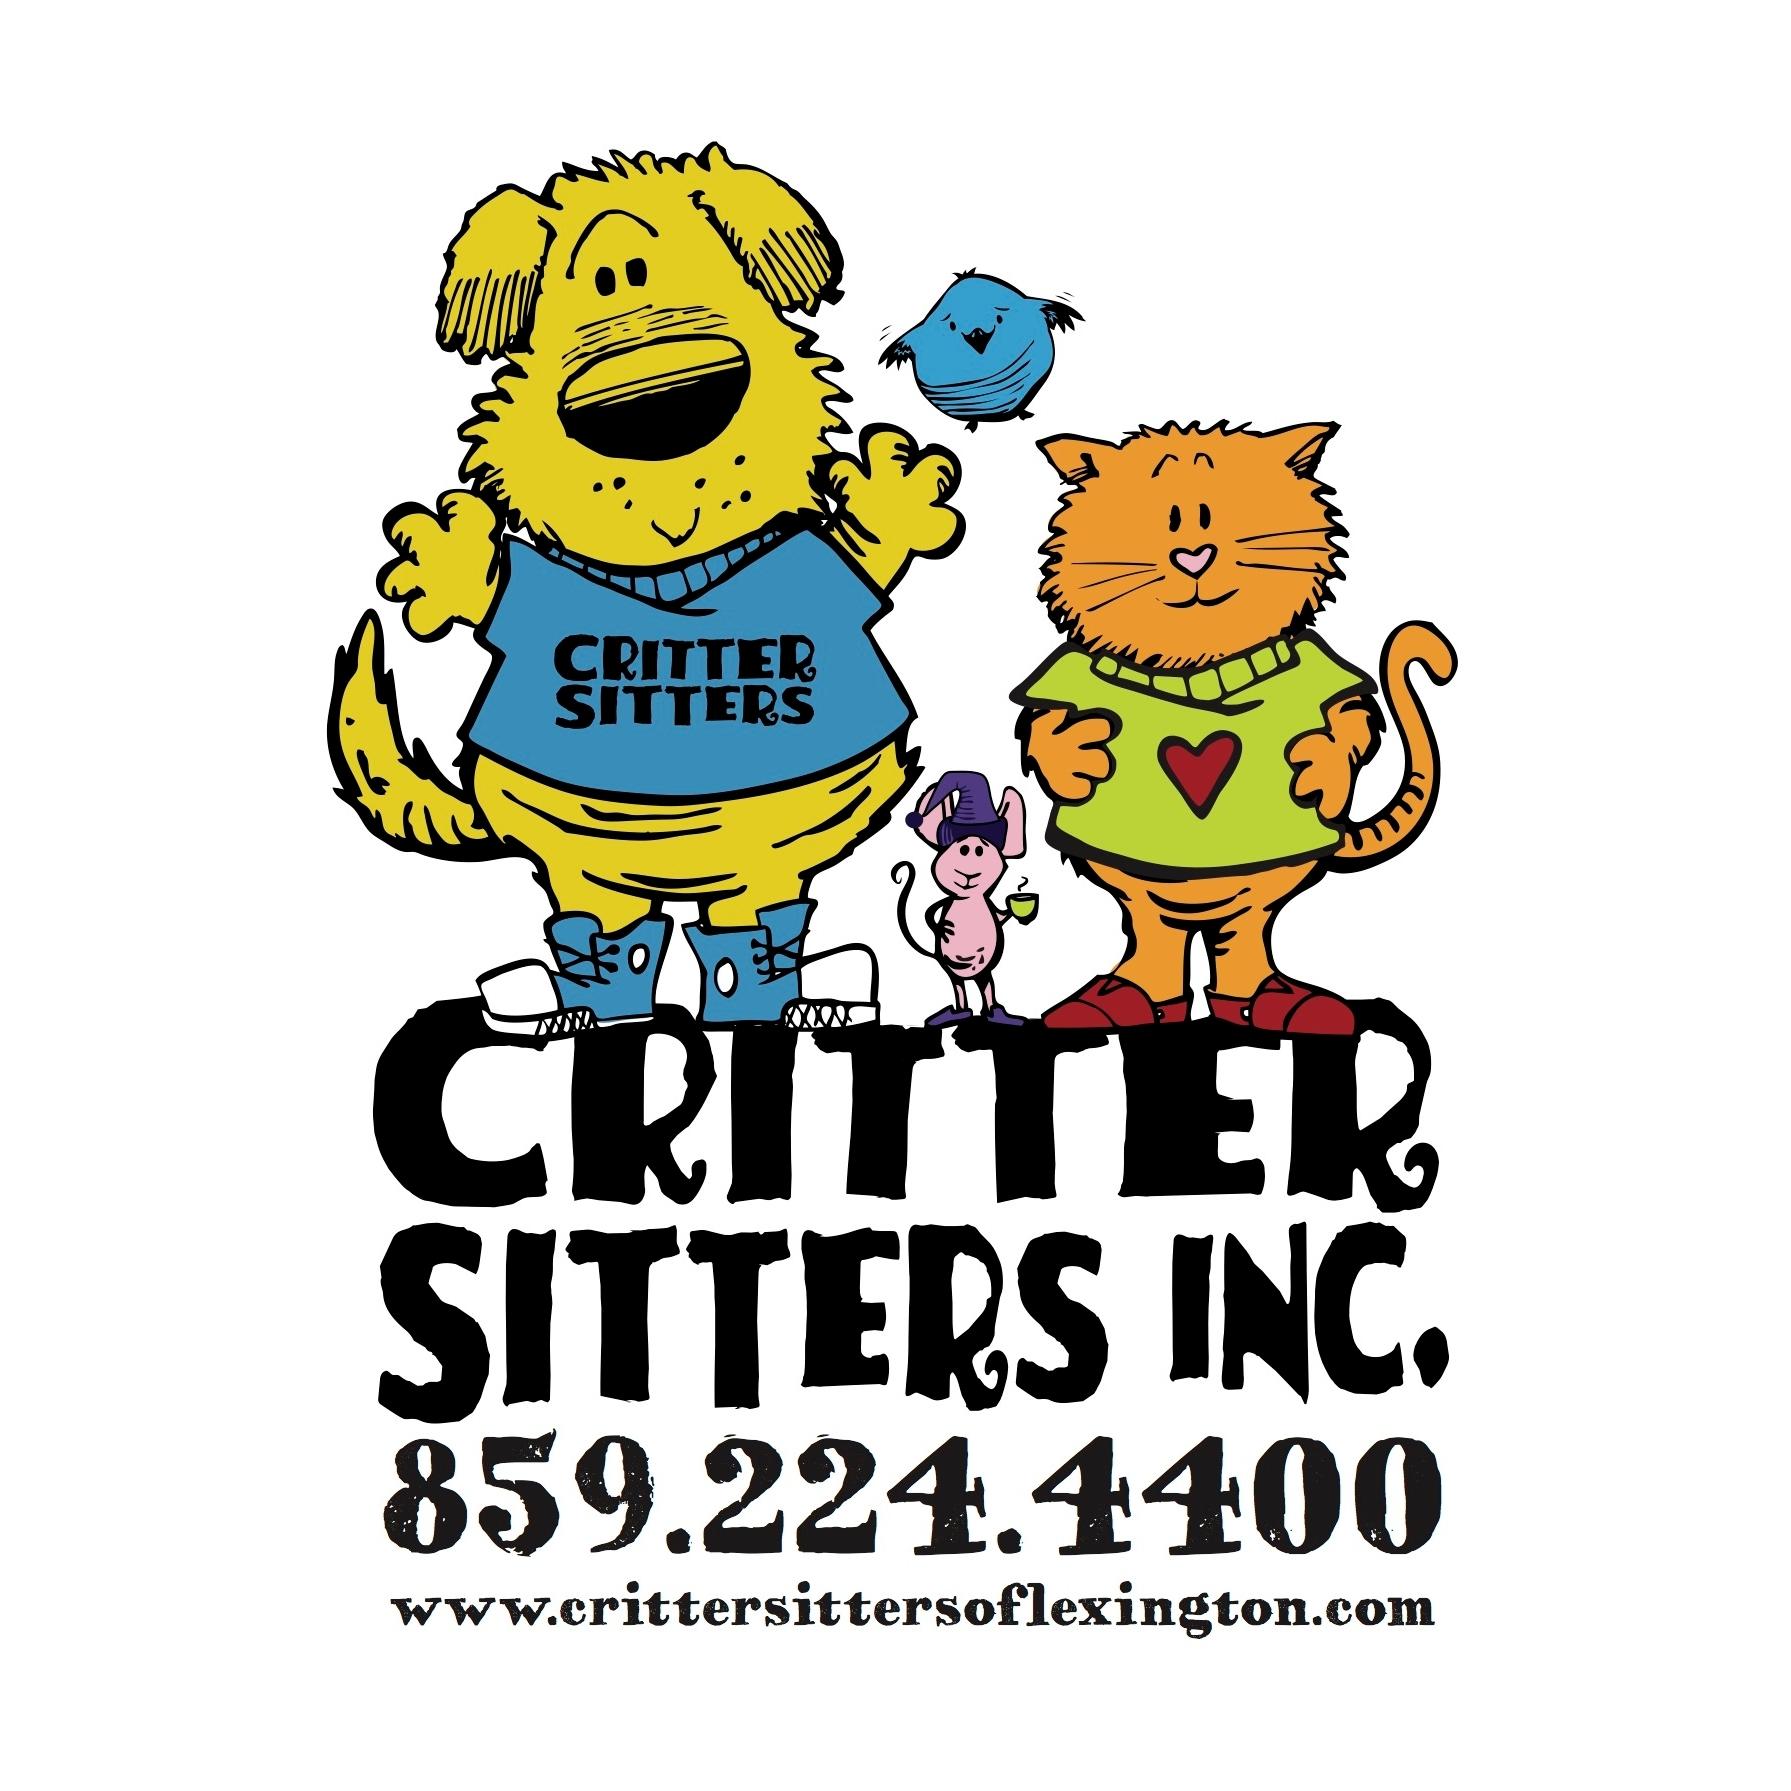 Critter Sitters of Lexington, Inc.